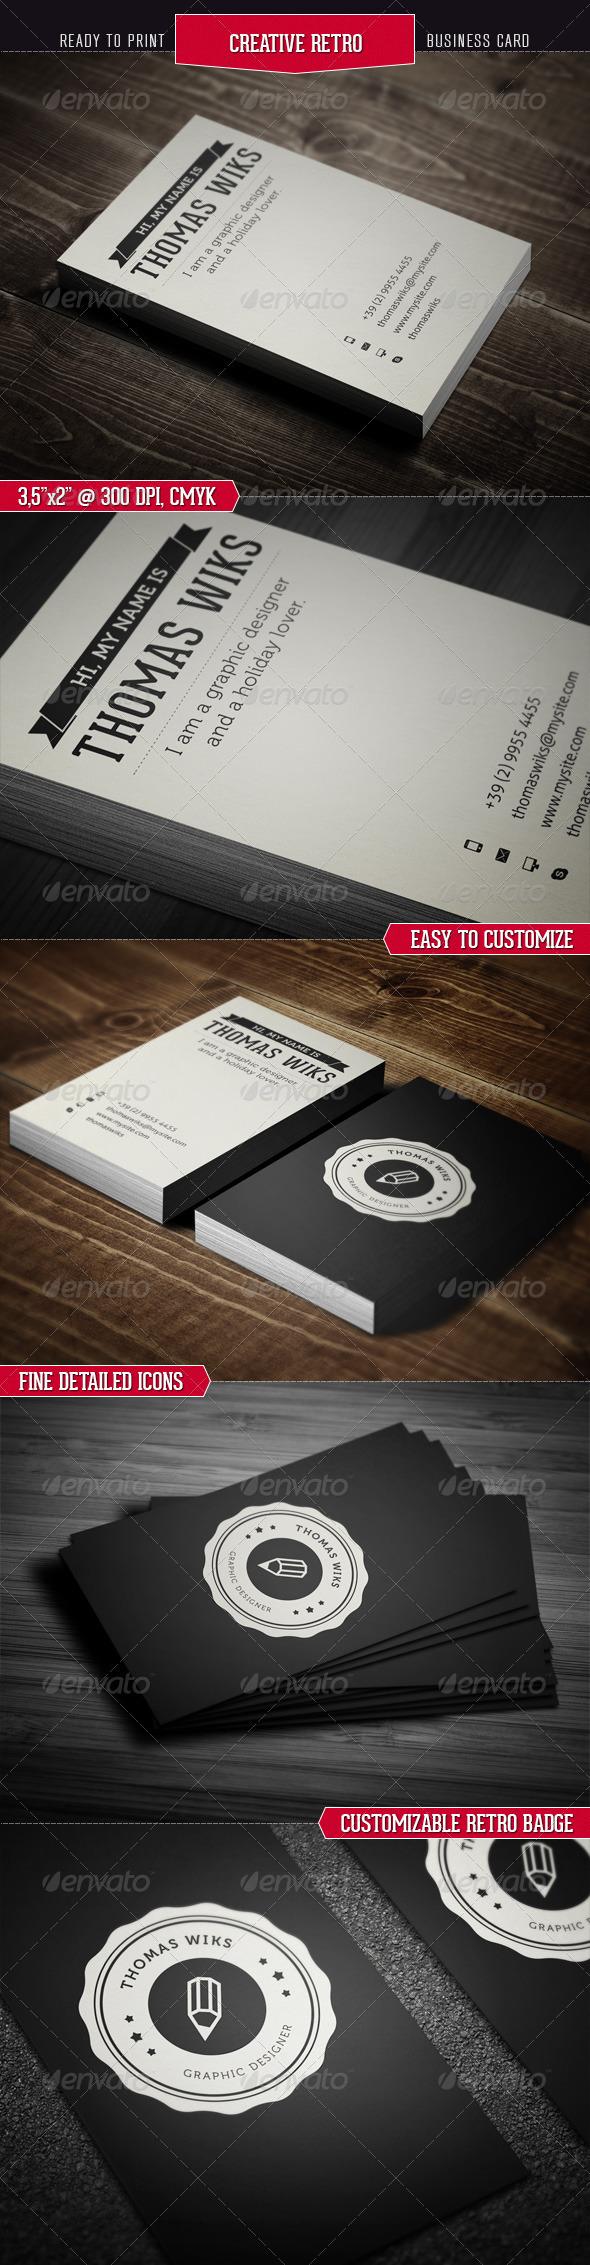 GraphicRiver Creative Retro Business Card 2793778